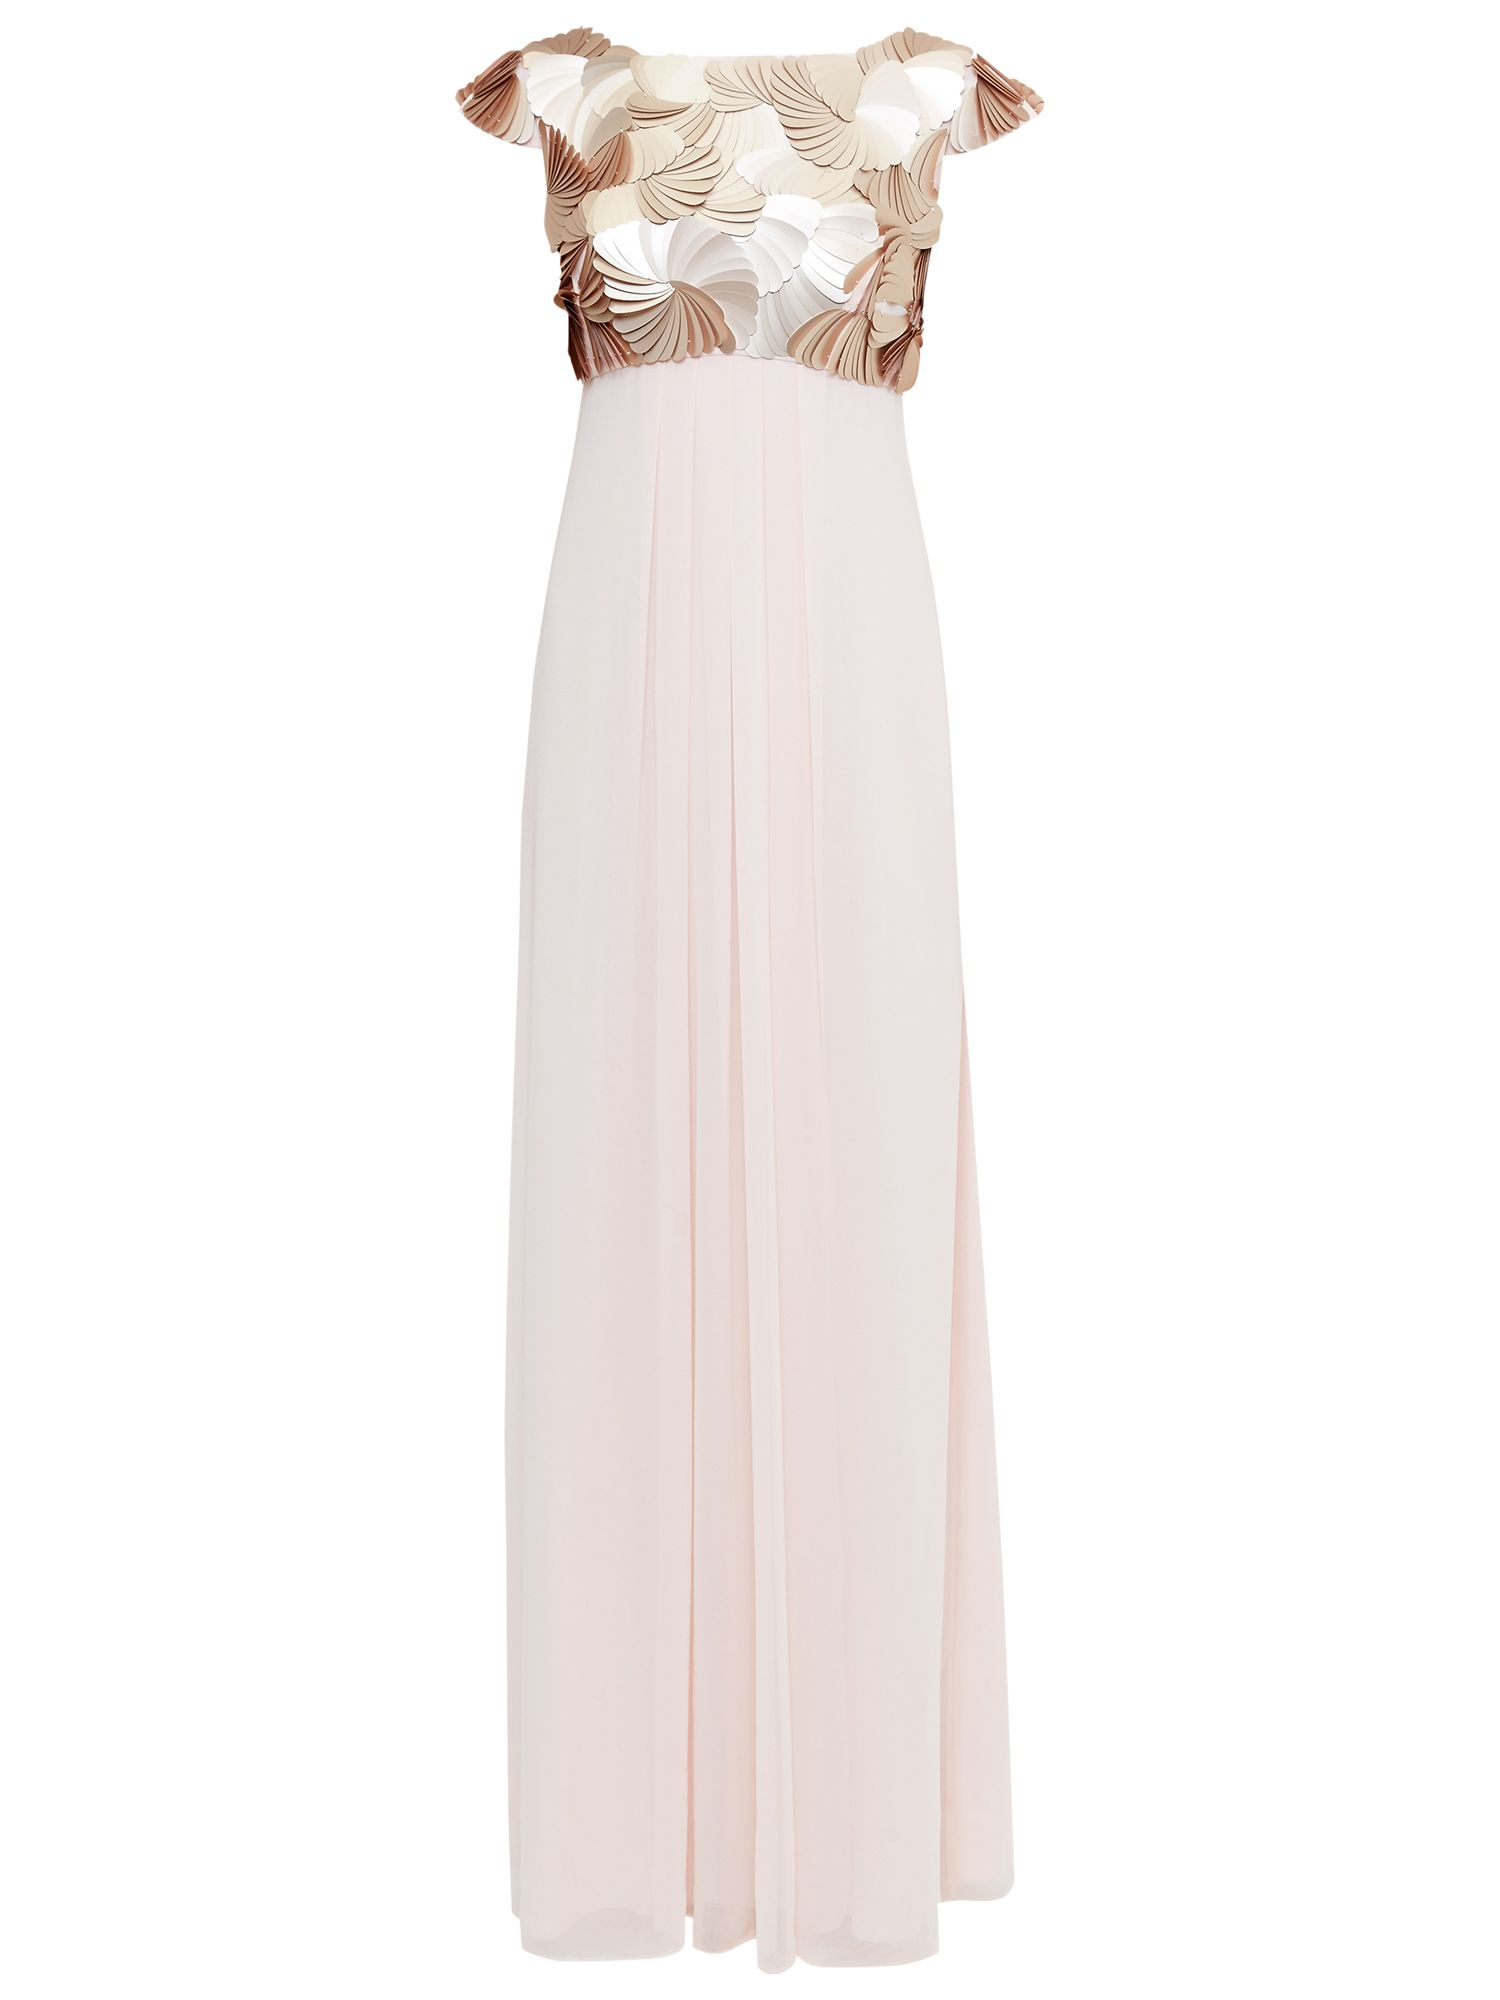 Gold bridesmaid dresses john lewis dress online uk for John lewis wedding dresses